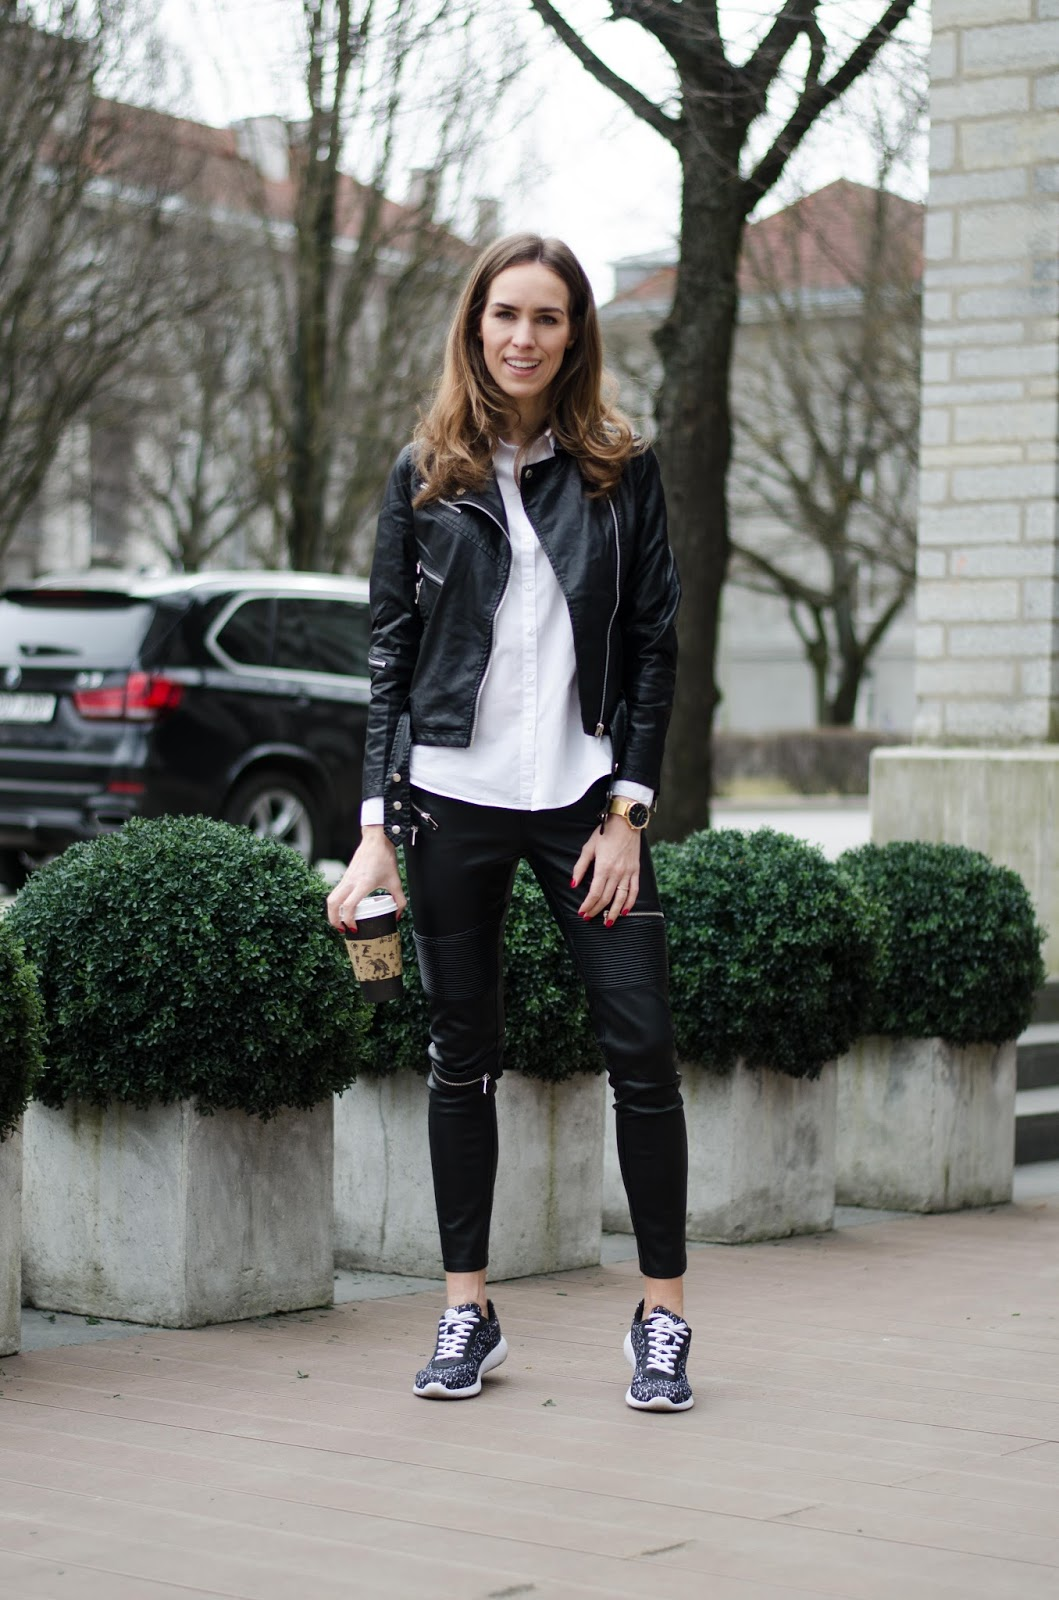 kristjaana mere leather jacket white shirt casual spring style